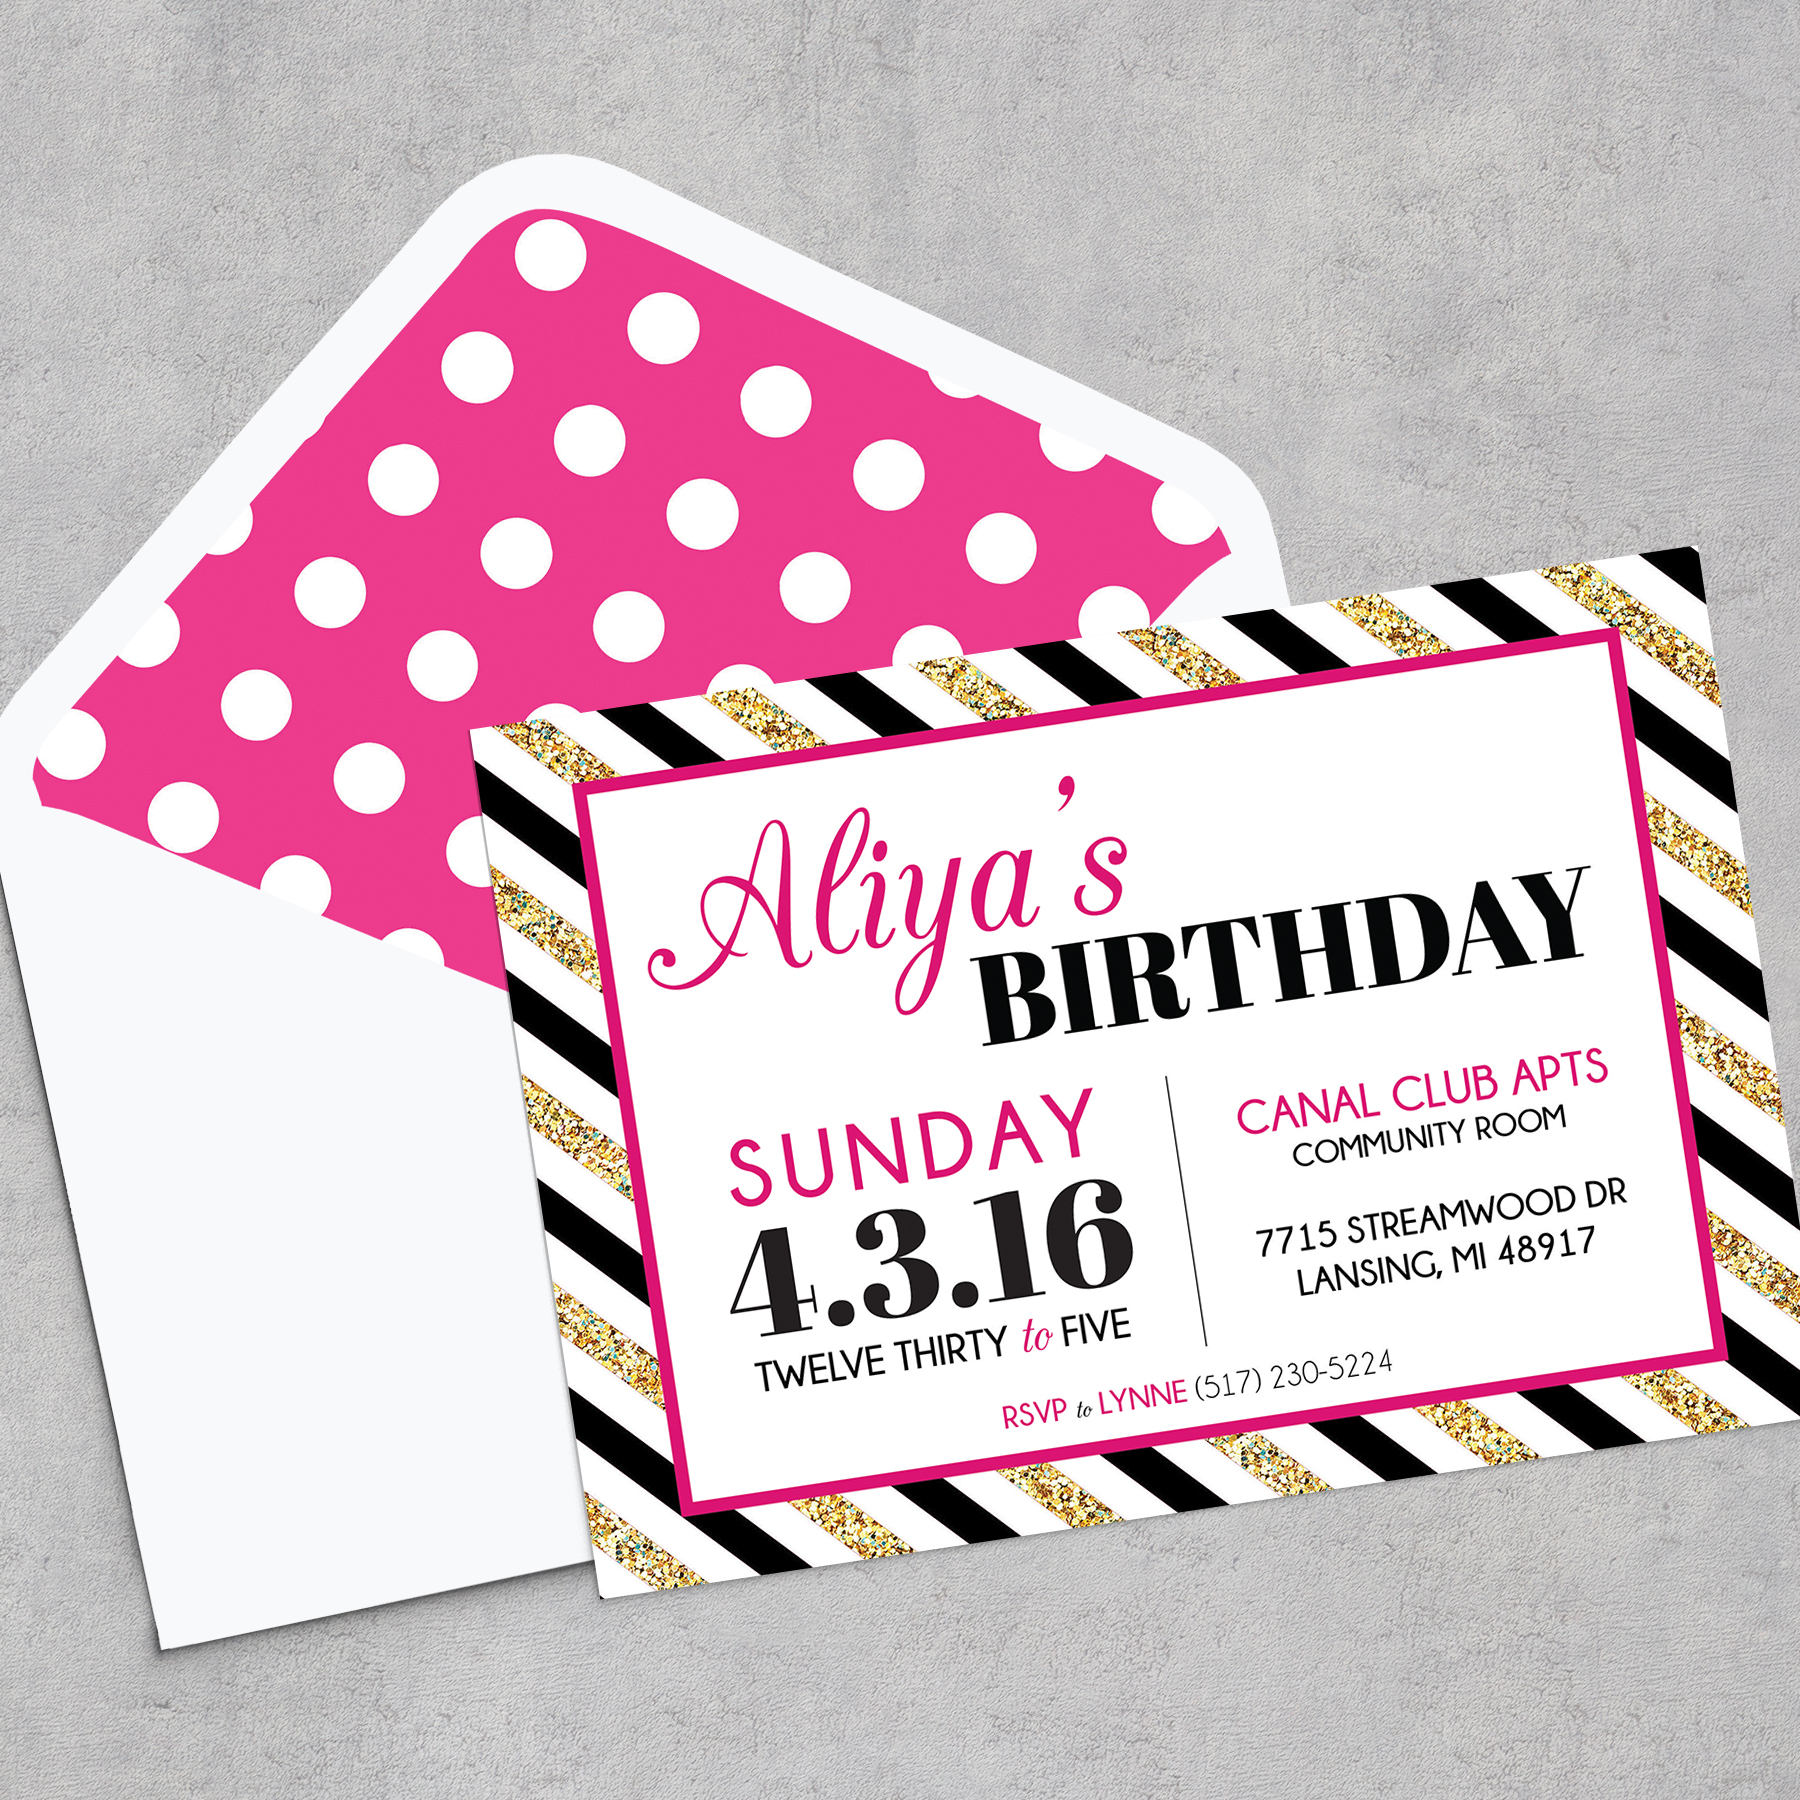 Modern glam inspired birthday party lansing mi pixie dust events glam kate spade inspired invitation stopboris Choice Image